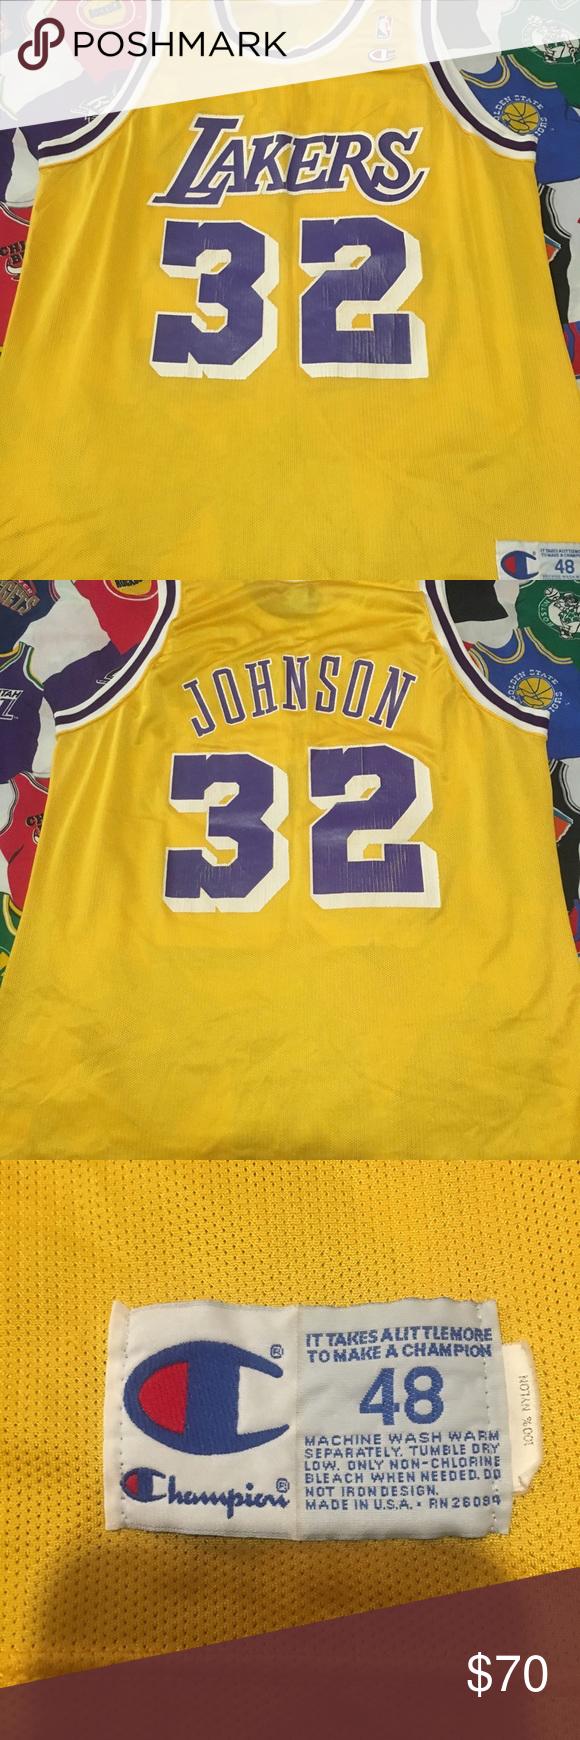 Vintage Champion Lakers Magic Johnson Jersey Vintage Champion Champion Shirts Magic Johnson